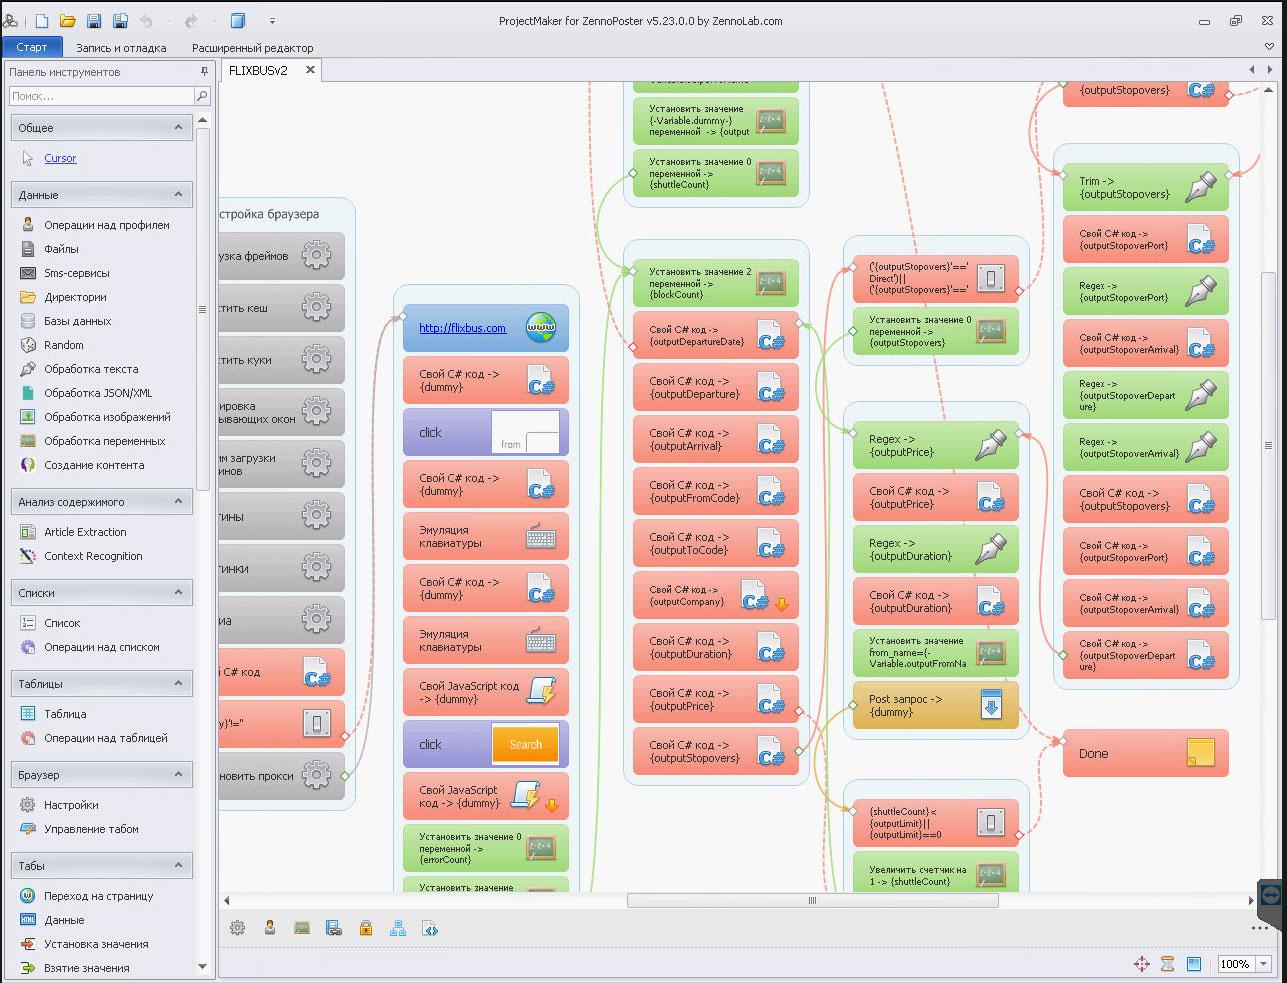 FlixBus.com: Решение для сервиса расчета маршрутов / Парсинг, ZennoPoster, API